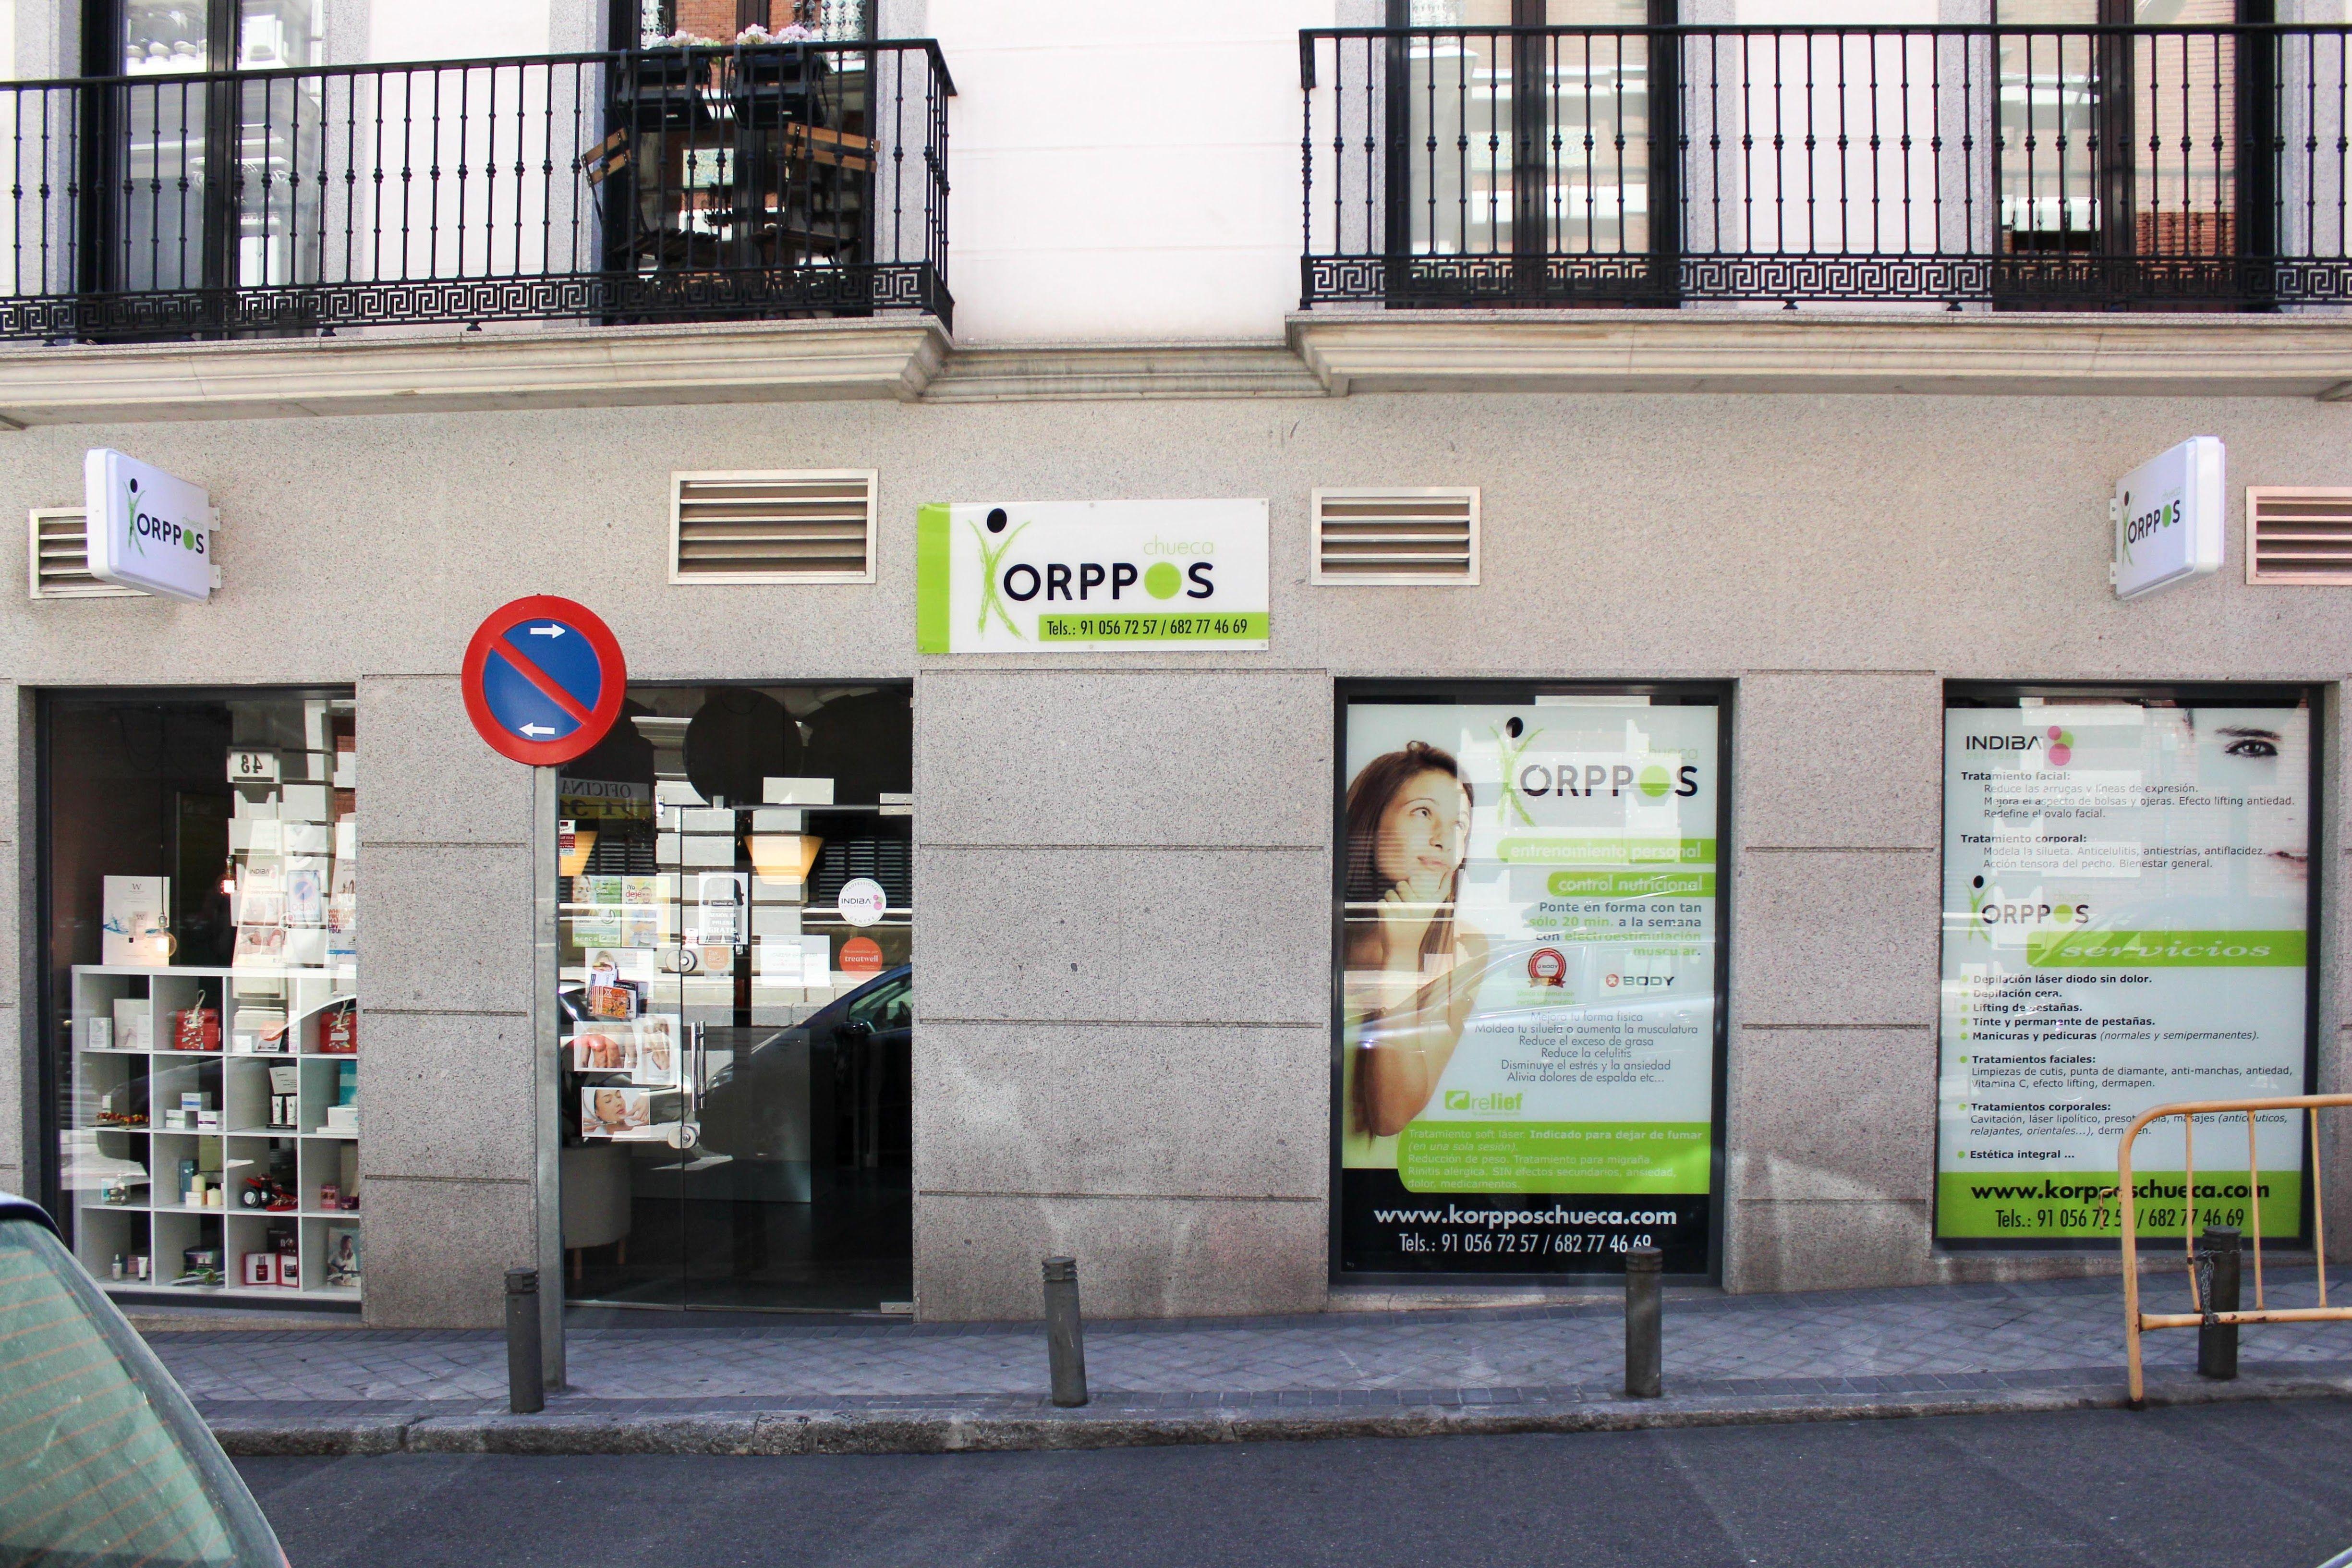 Foto 8 de Entrenamiento en Madrid | Korppos Chueca